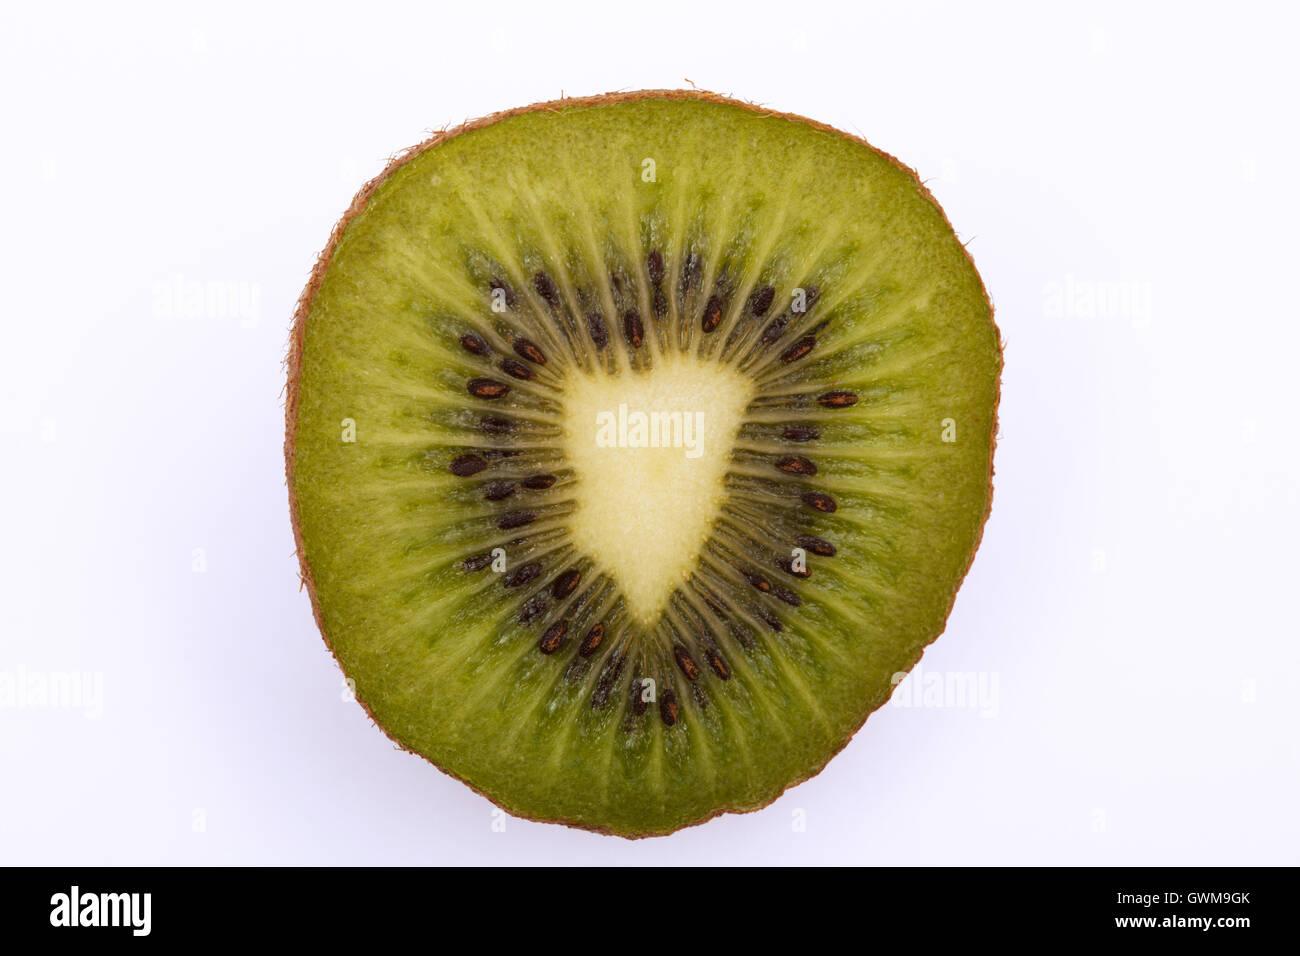 Halved kiwi fruit with heart shaped center. Kiwi fruit is said to promote heart health - Stock Image